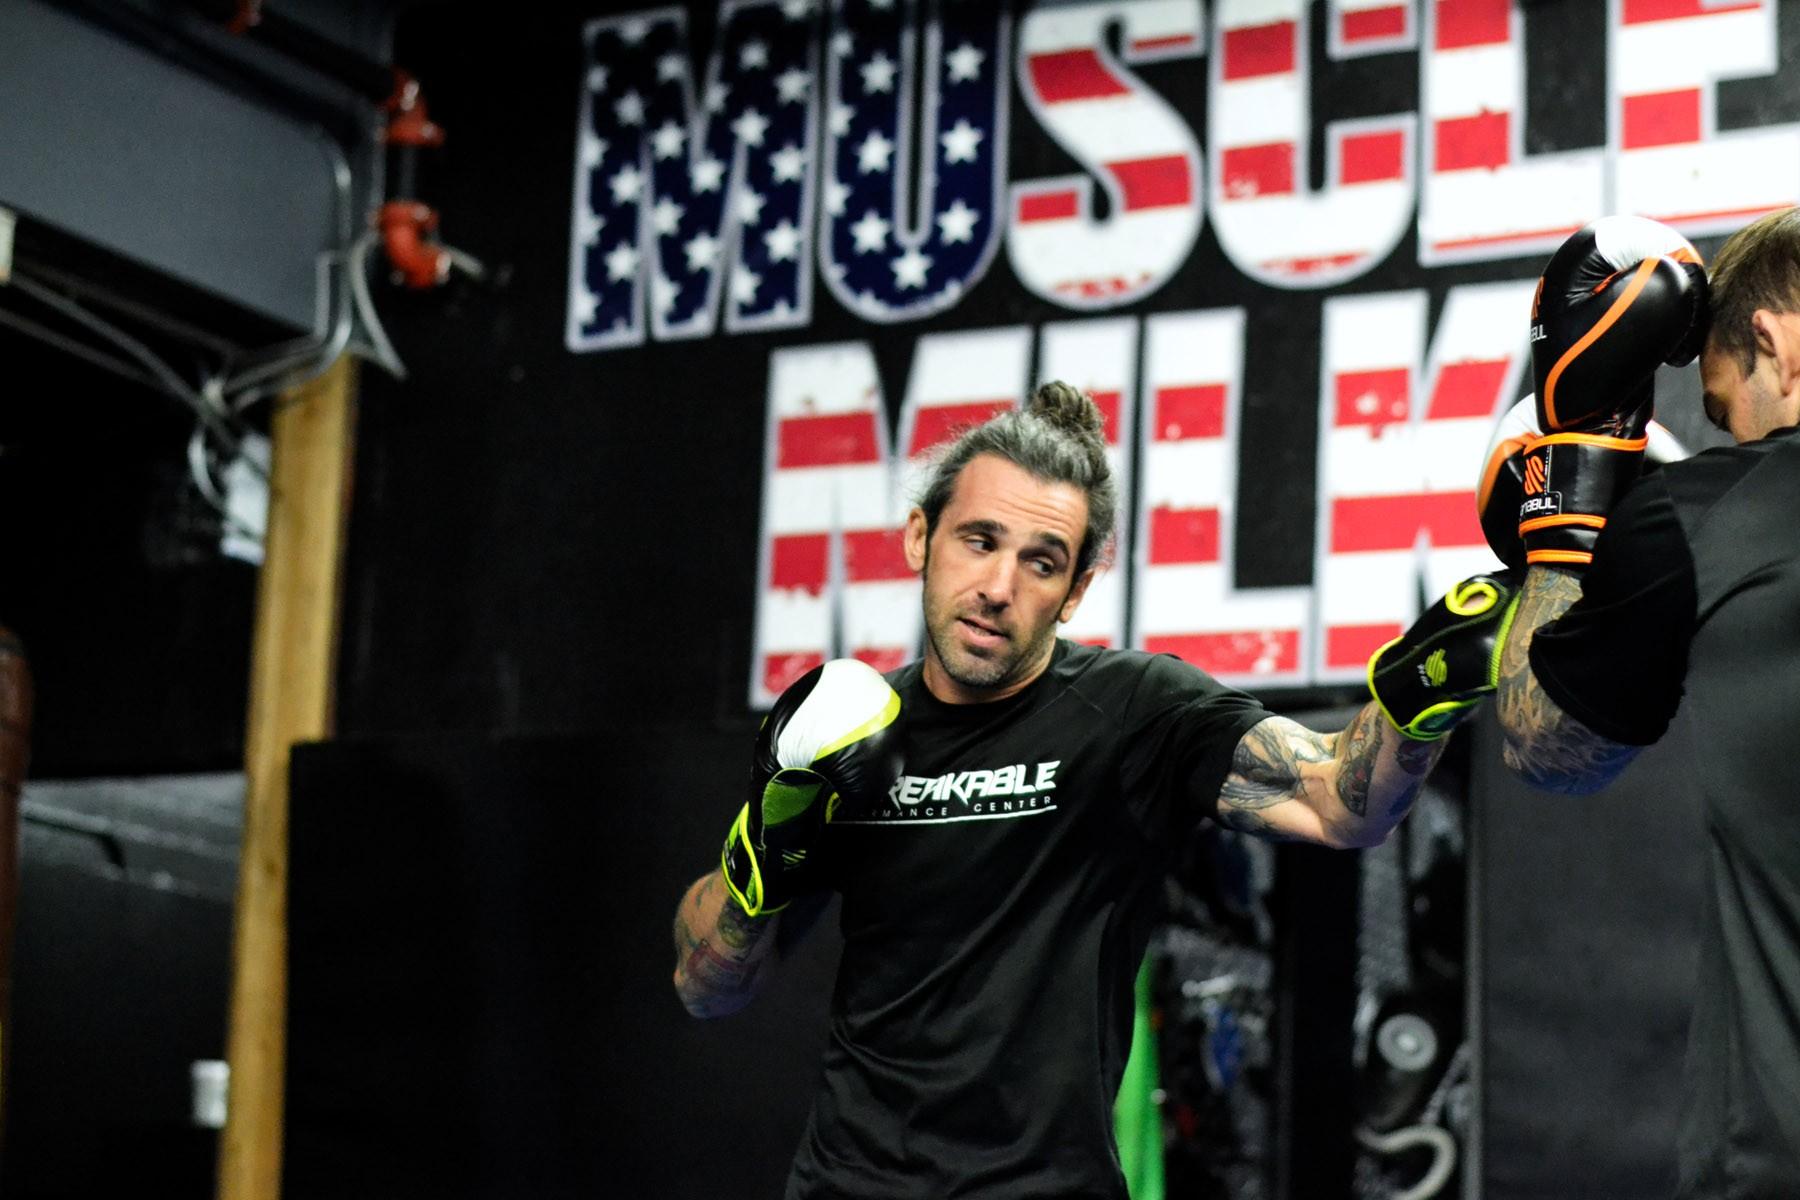 Trainer Jason Borba spars with Guilherme Bomba Vasconcelos